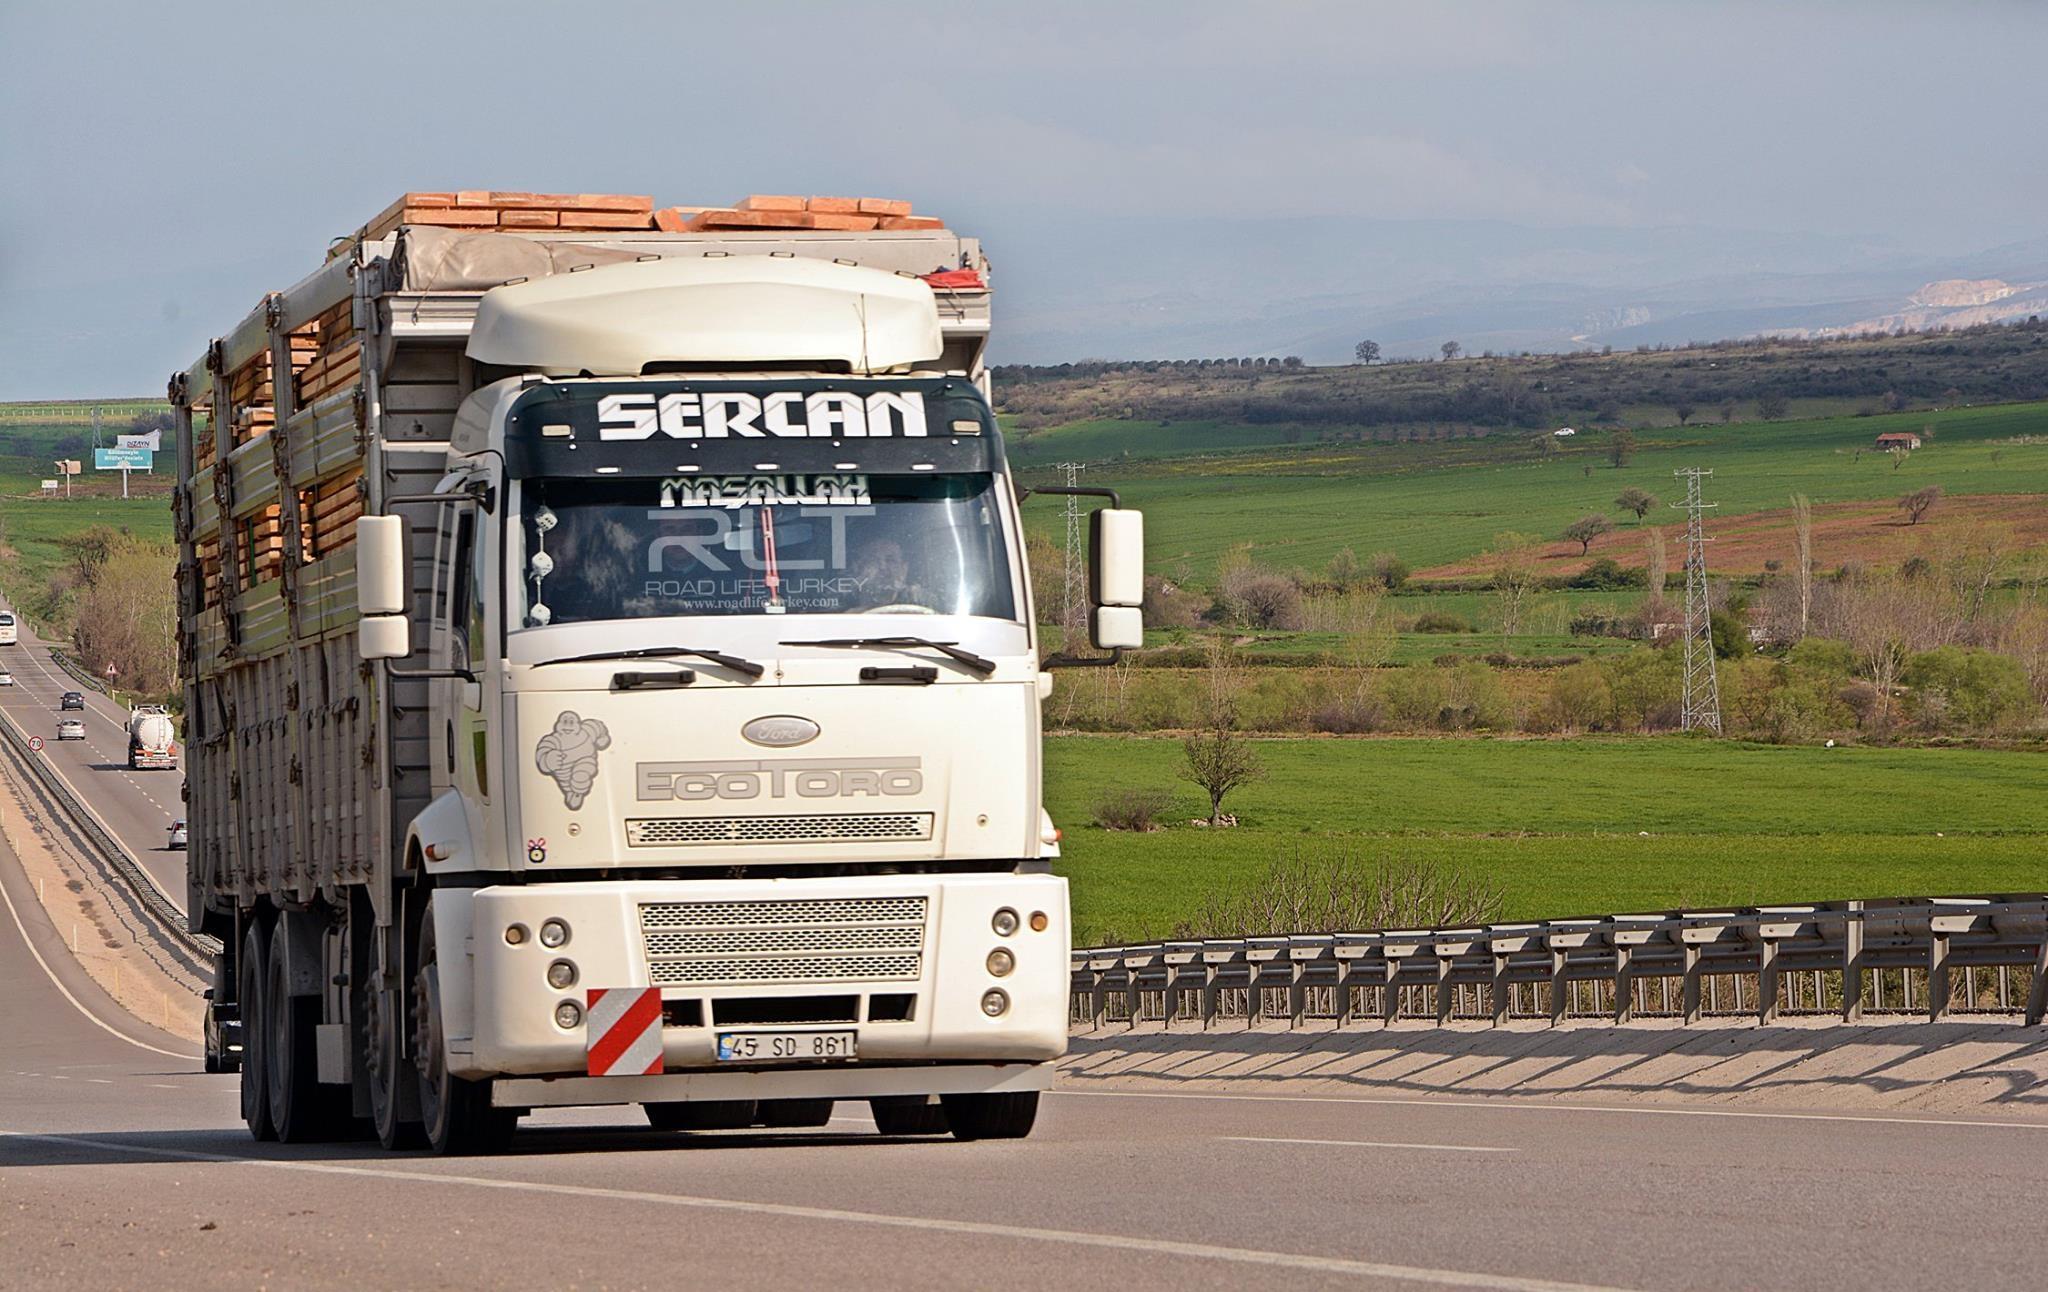 Ford-cargo-bursa---izmir-road